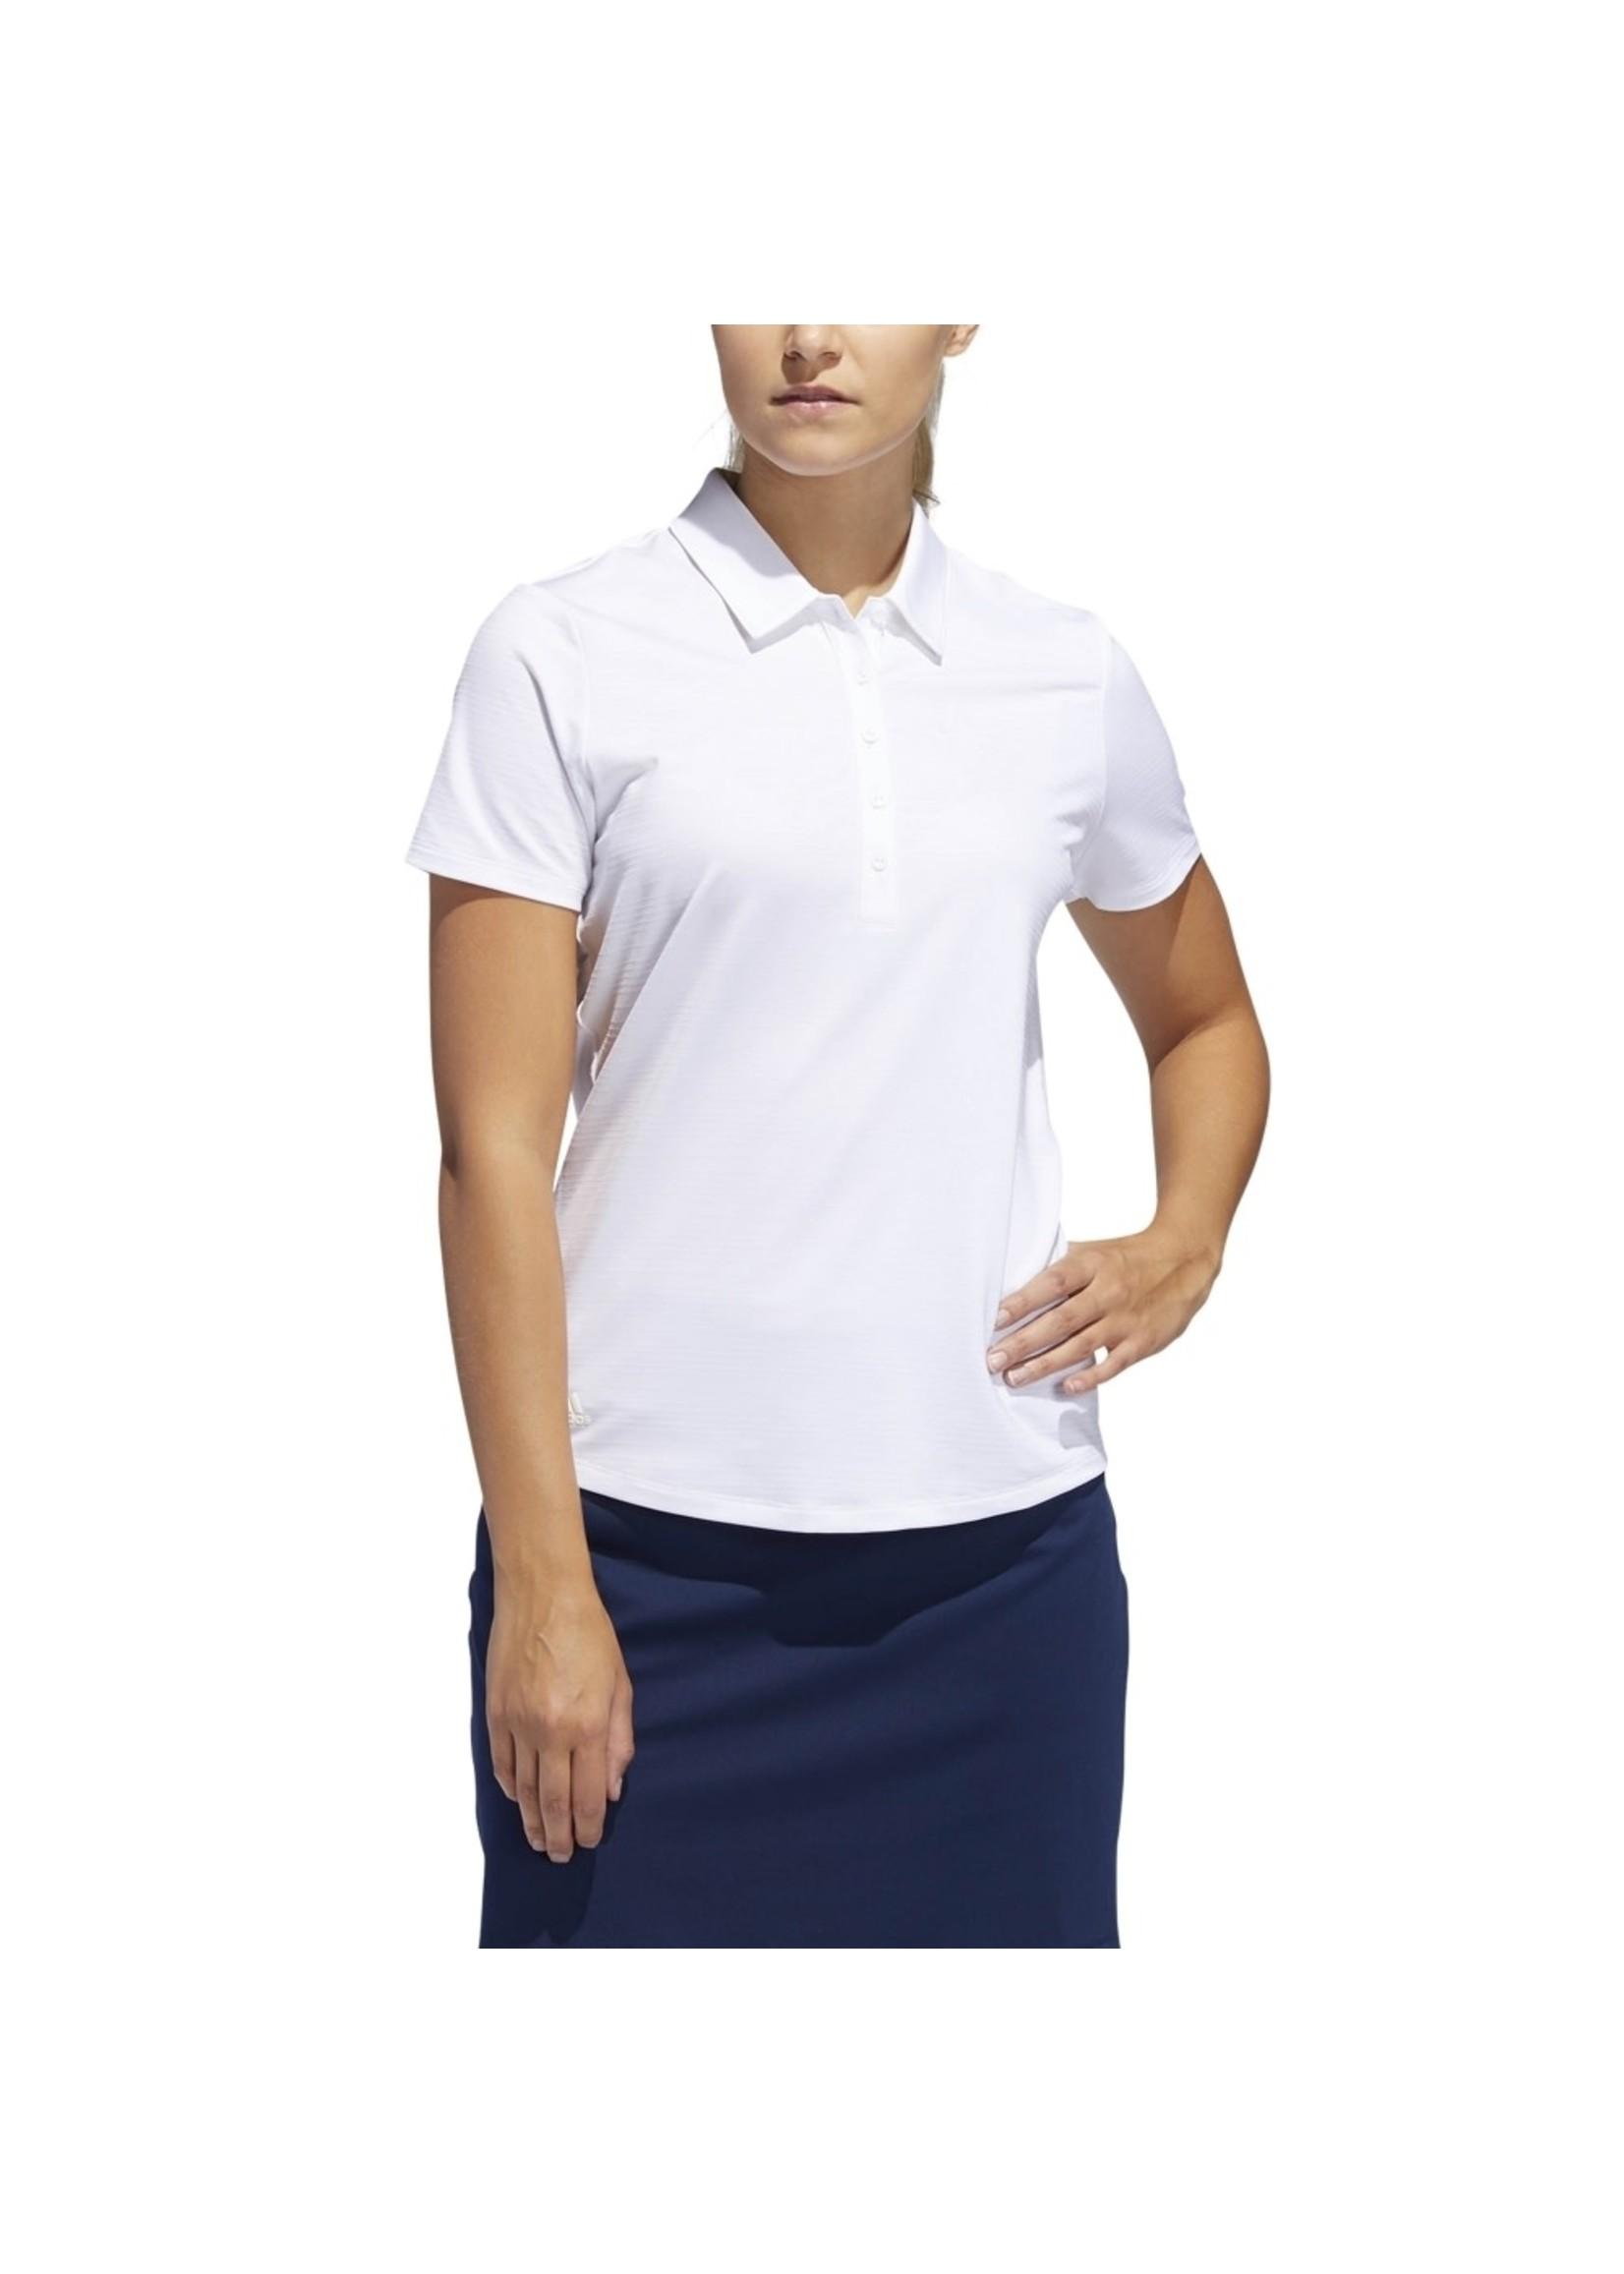 Adidas Adidas Ladies Microdot Golf Polo Shirt (2019)